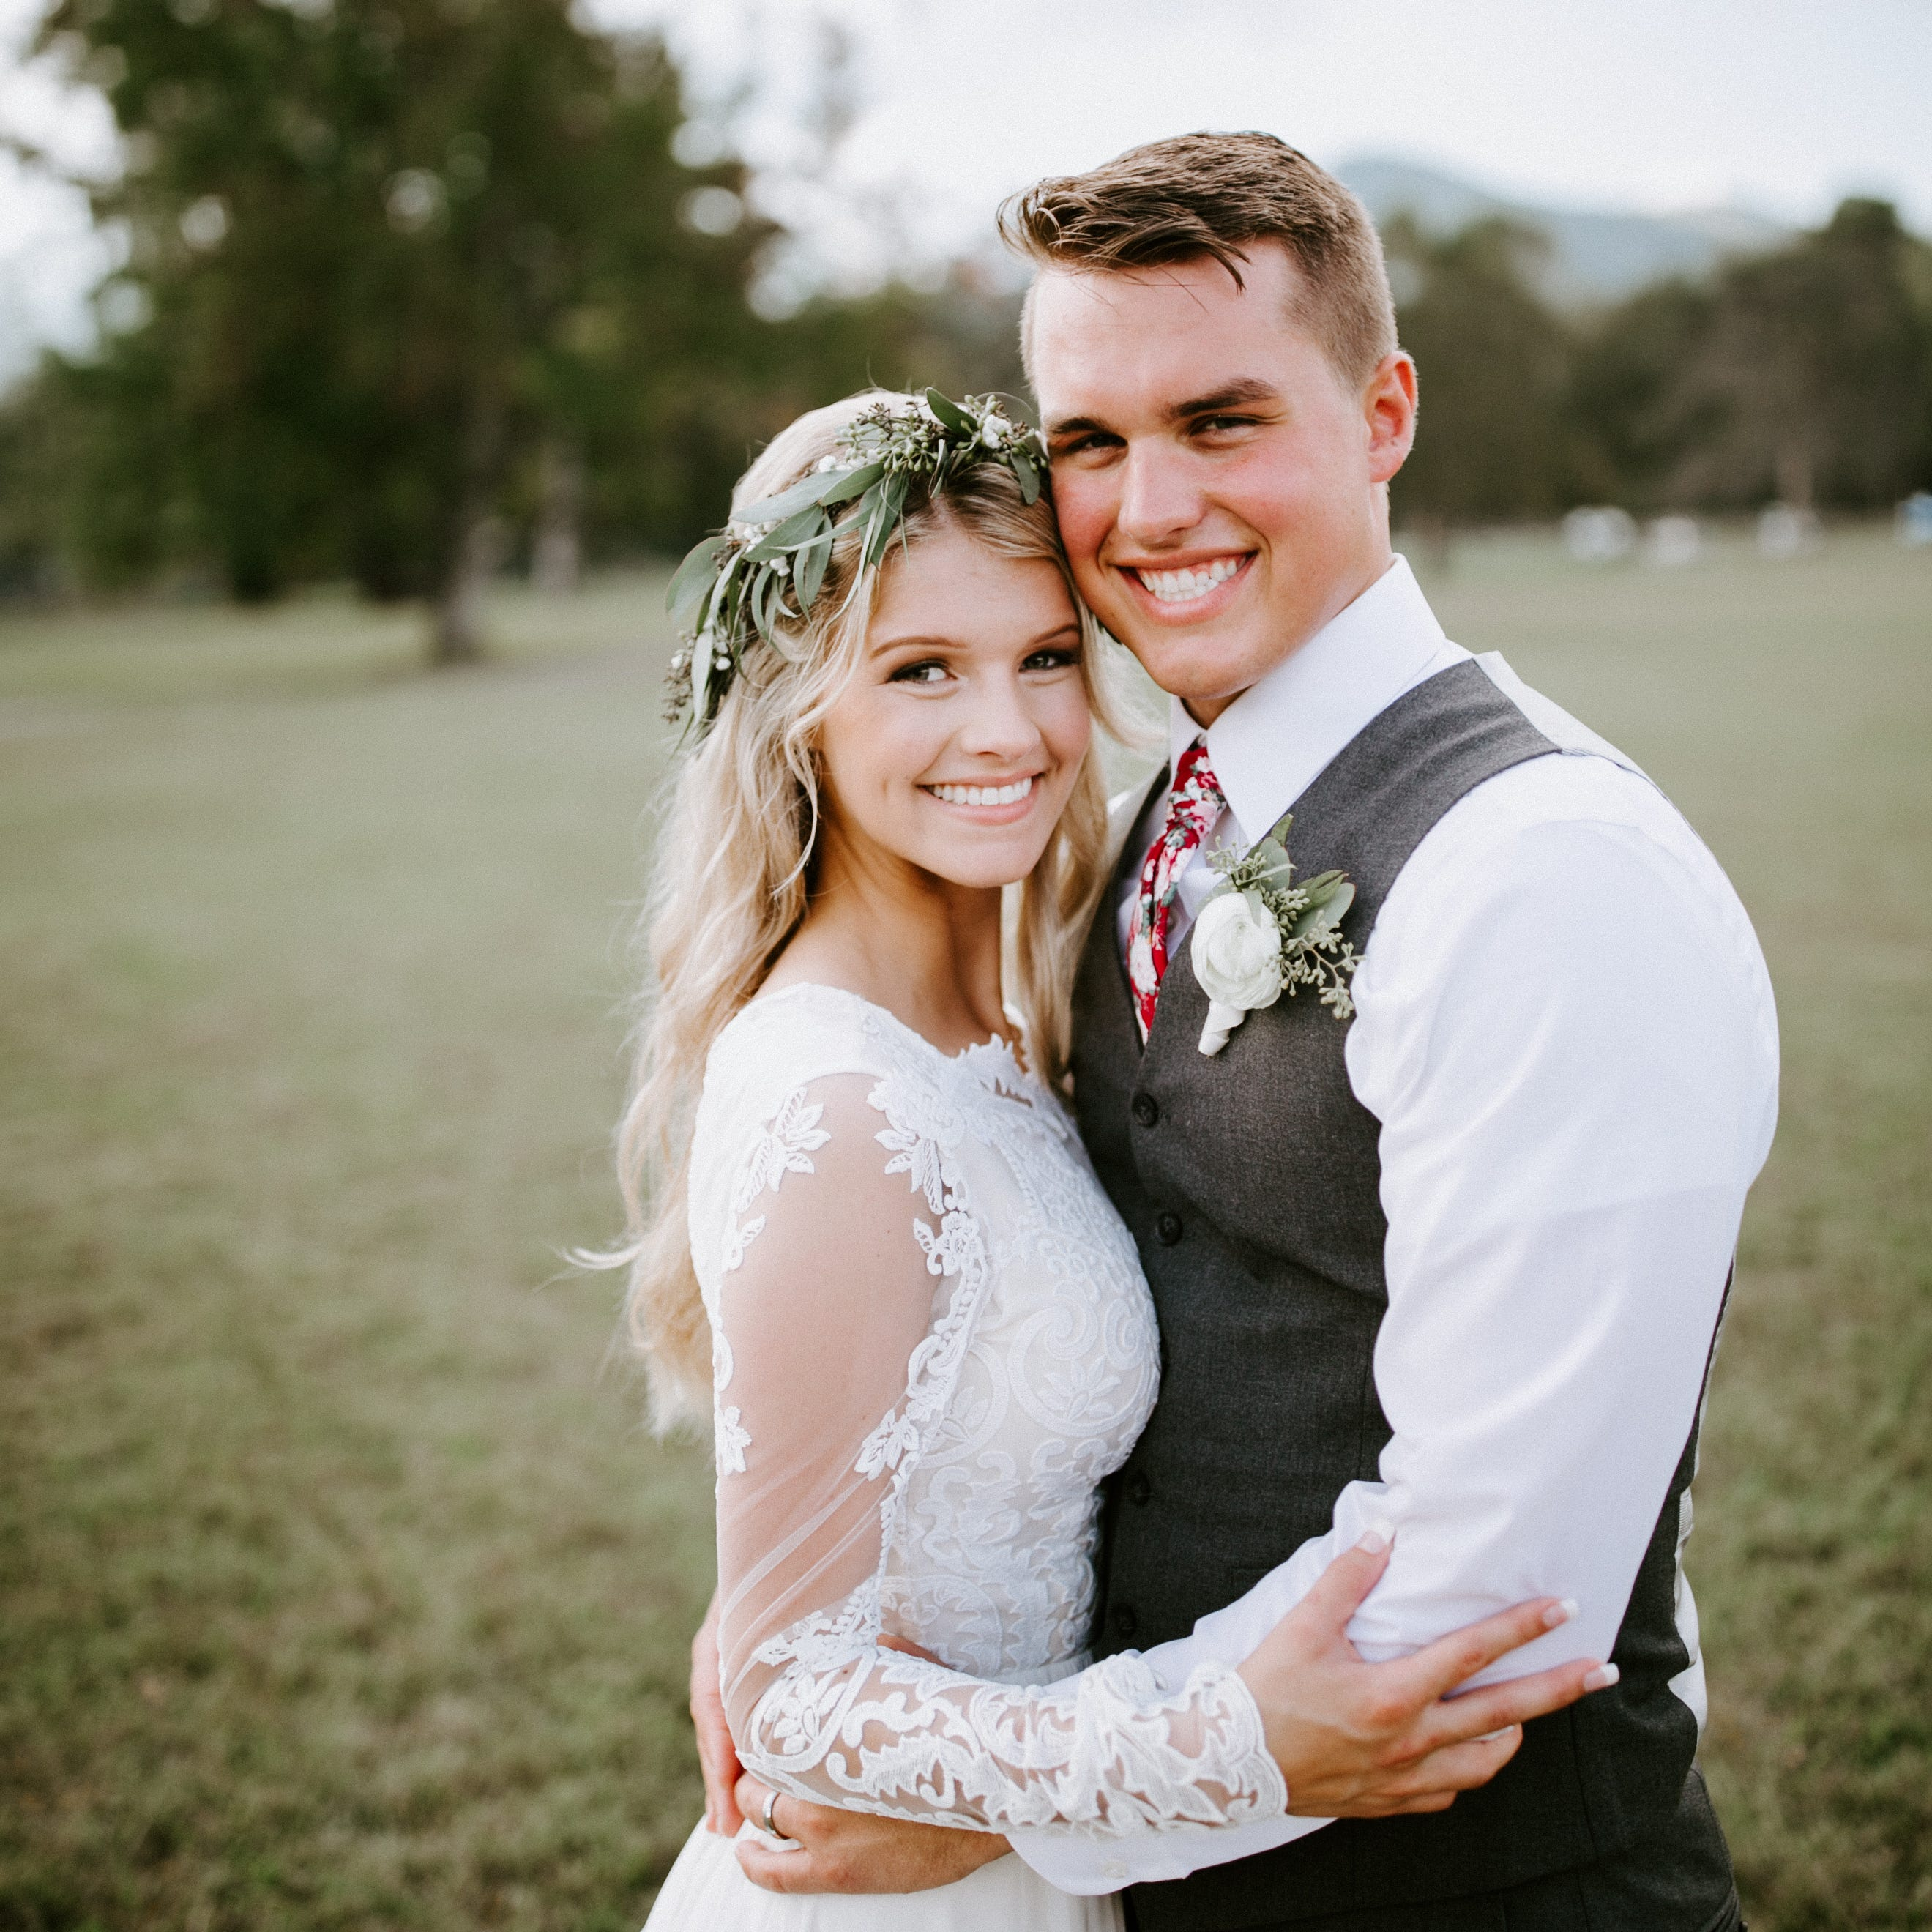 'Bringing Up Bates' stars Josie Bates, Kelton Balka marry in East Tennessee state park